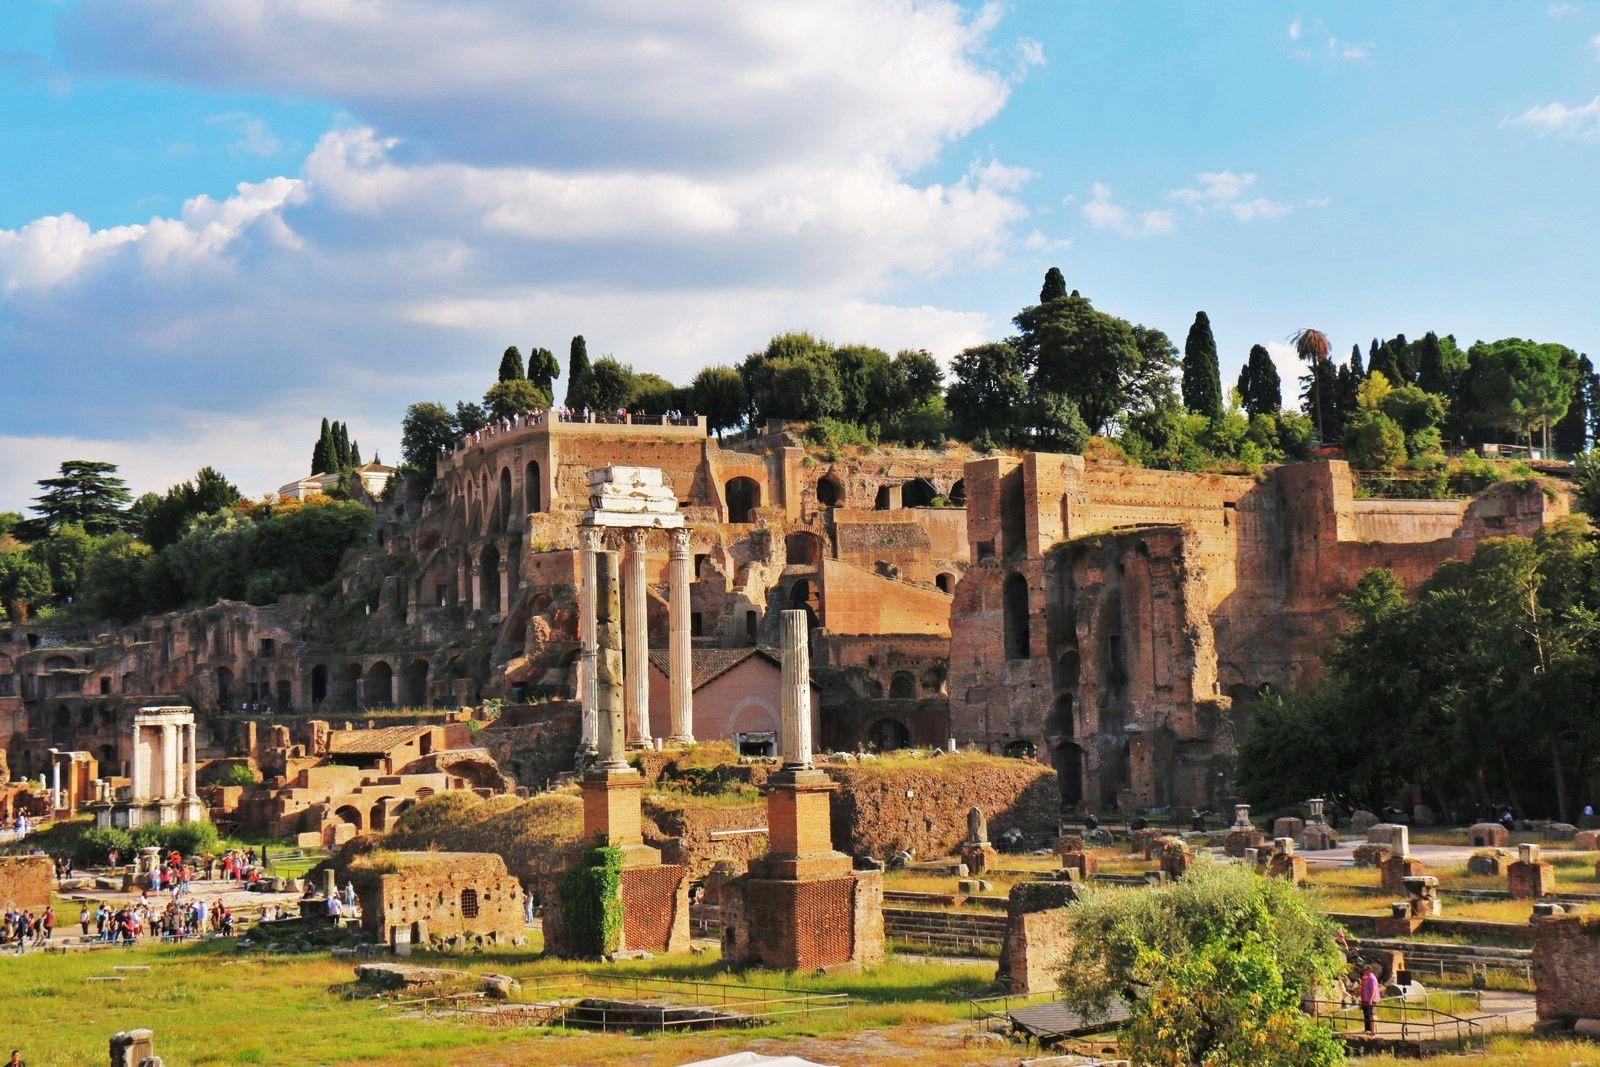 Le Forum Romain, Rome